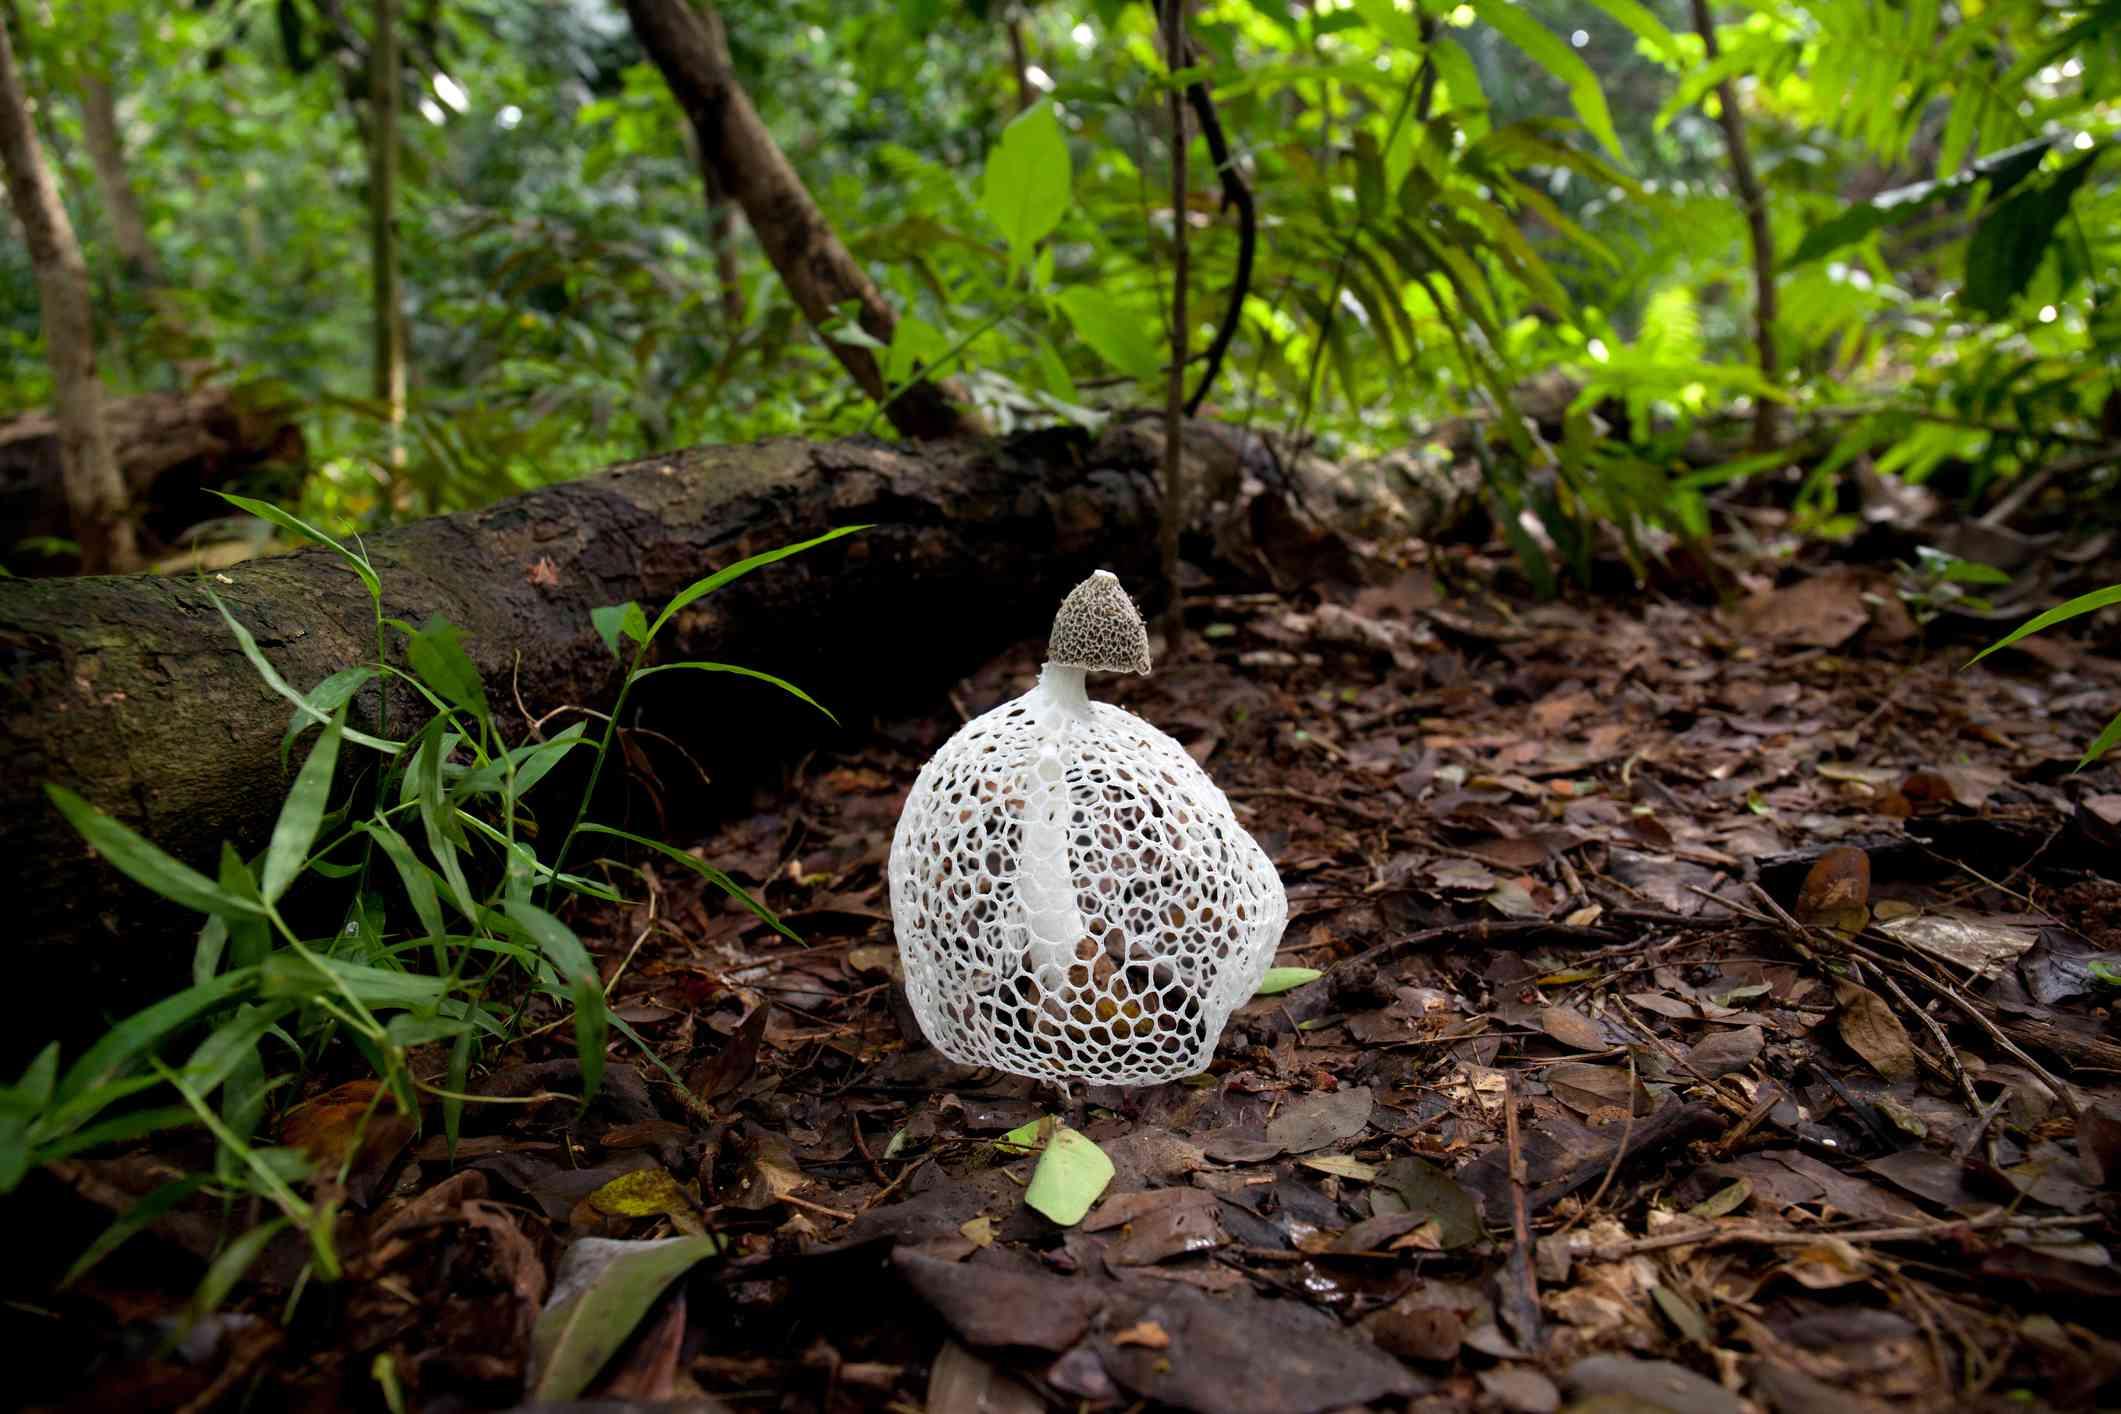 Phallus Indusiatus growing on wet forest floor